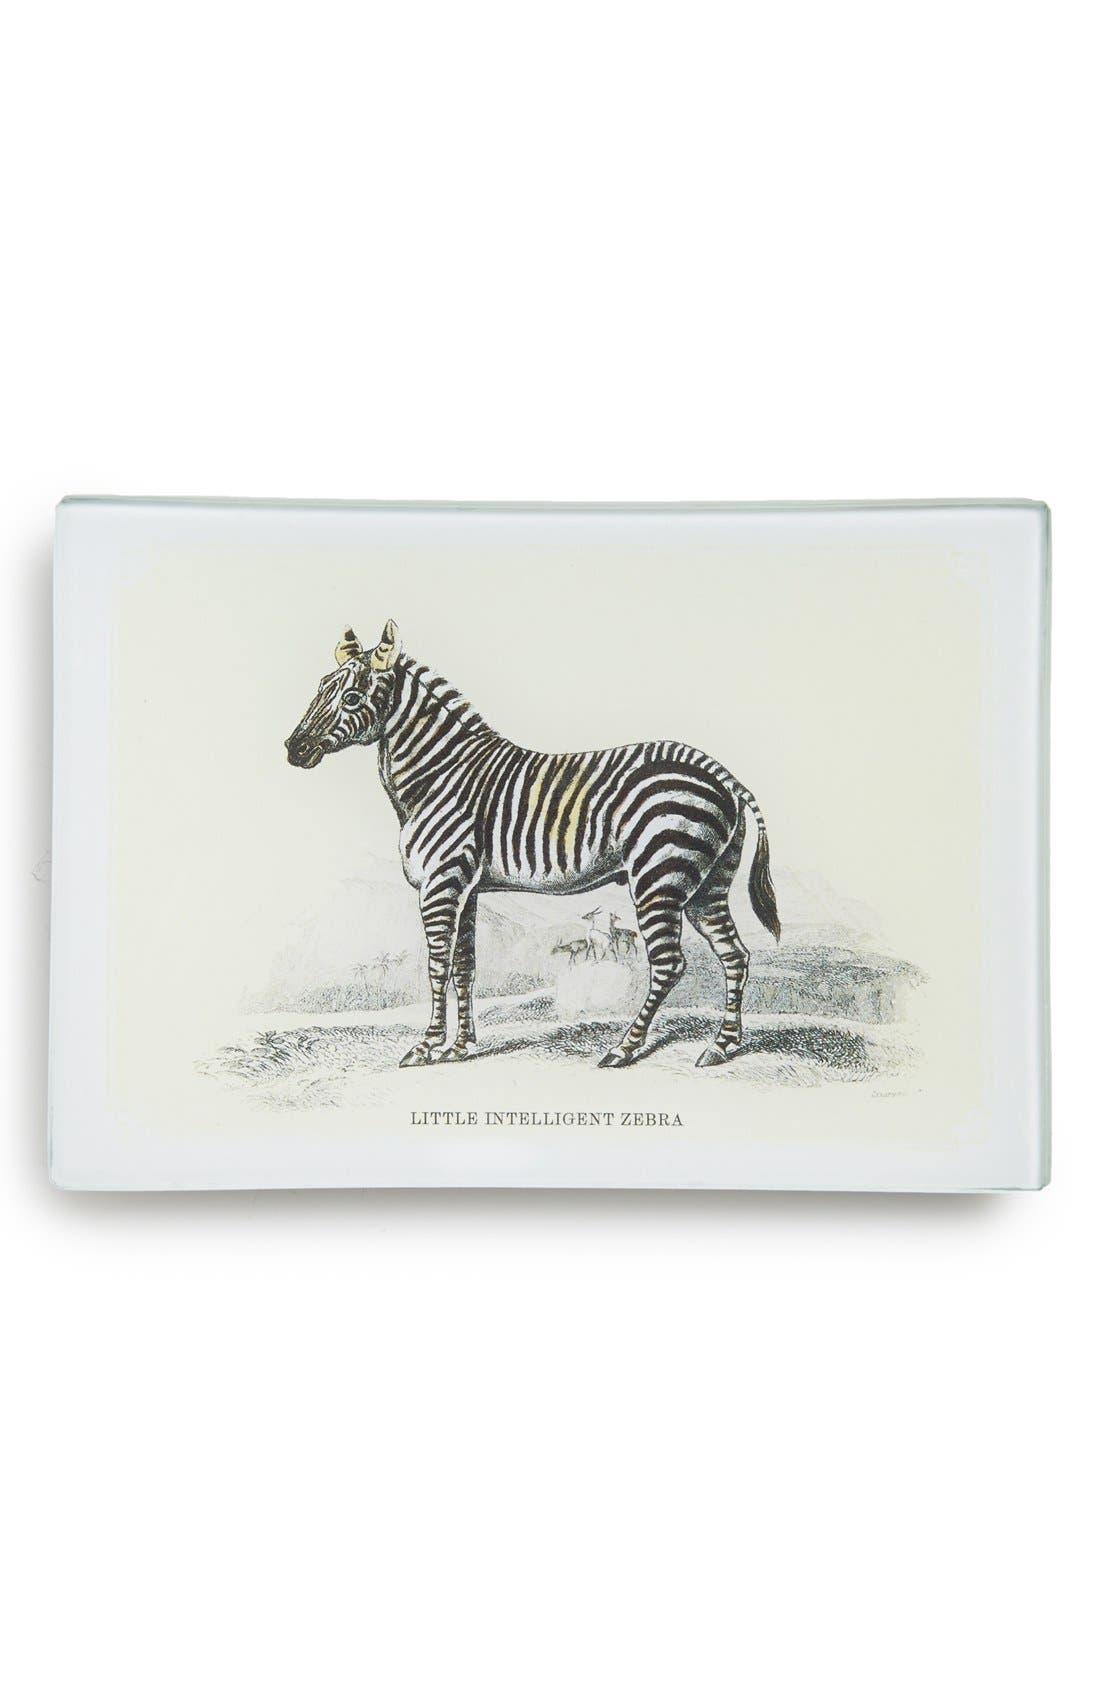 Main Image - Ben's Garden 'Little Intelligent Zebra' Decorative Glass Tray